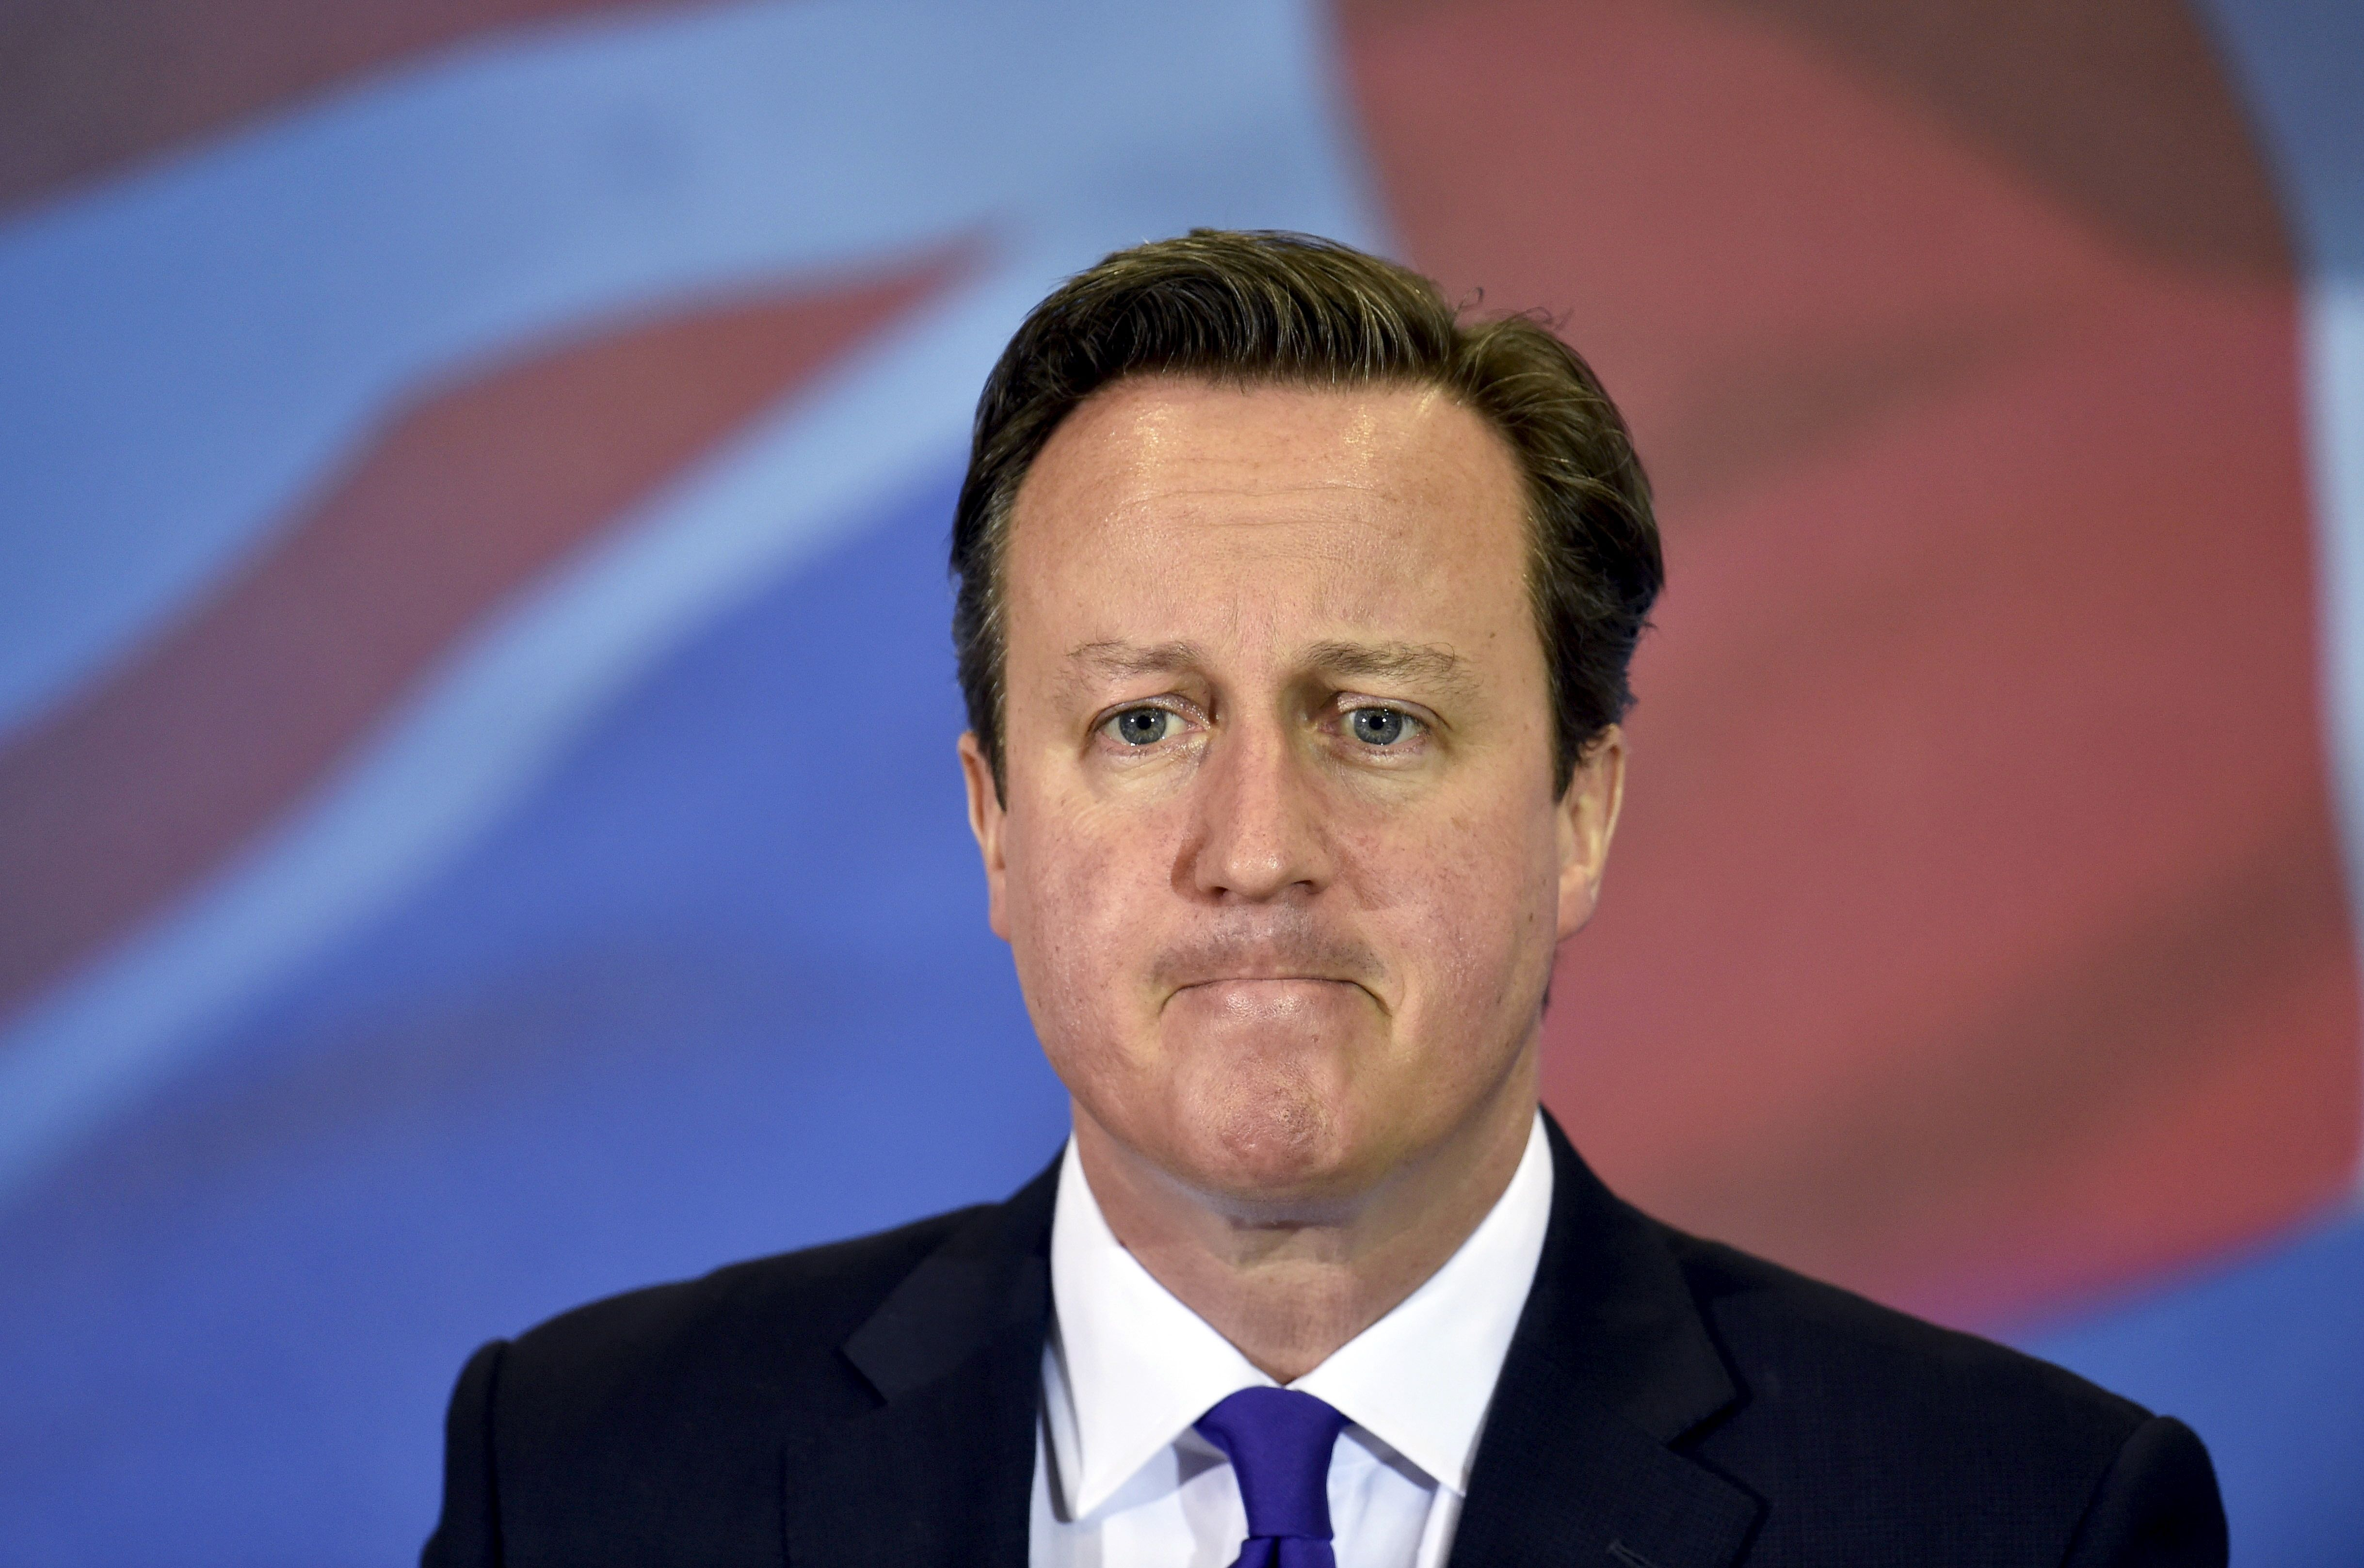 Le premier ministre David Cameron